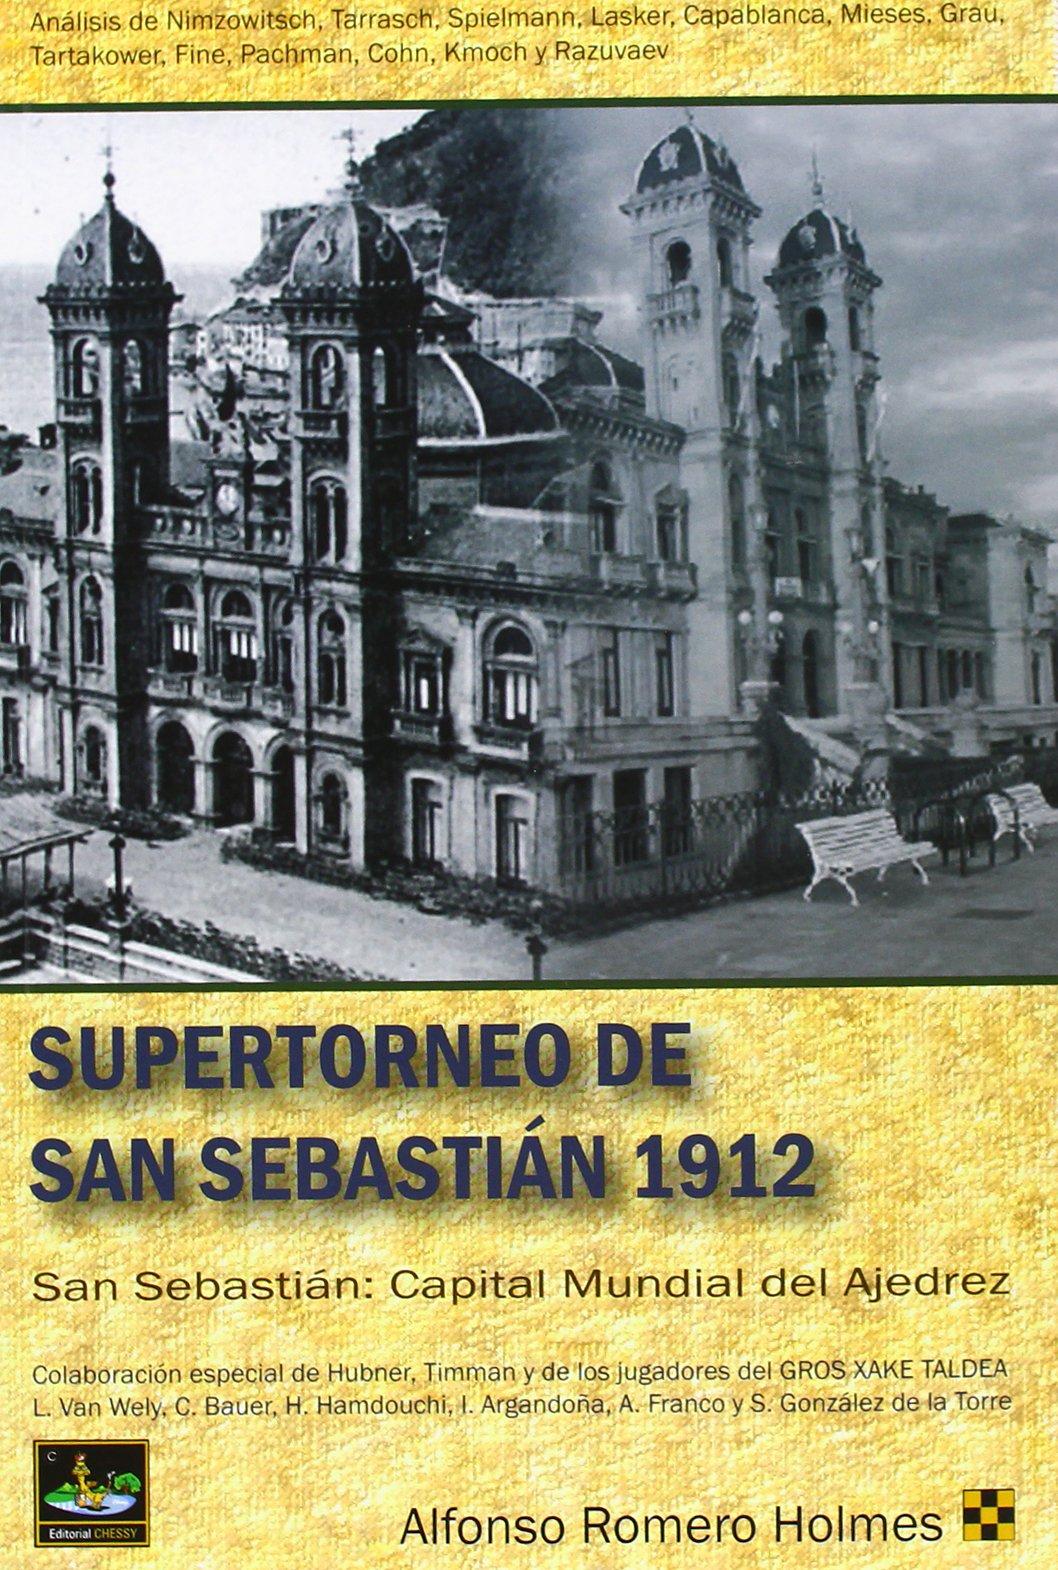 Amazon.com: Supertorneo de San Sebastián 1912 (9788494032011 ...